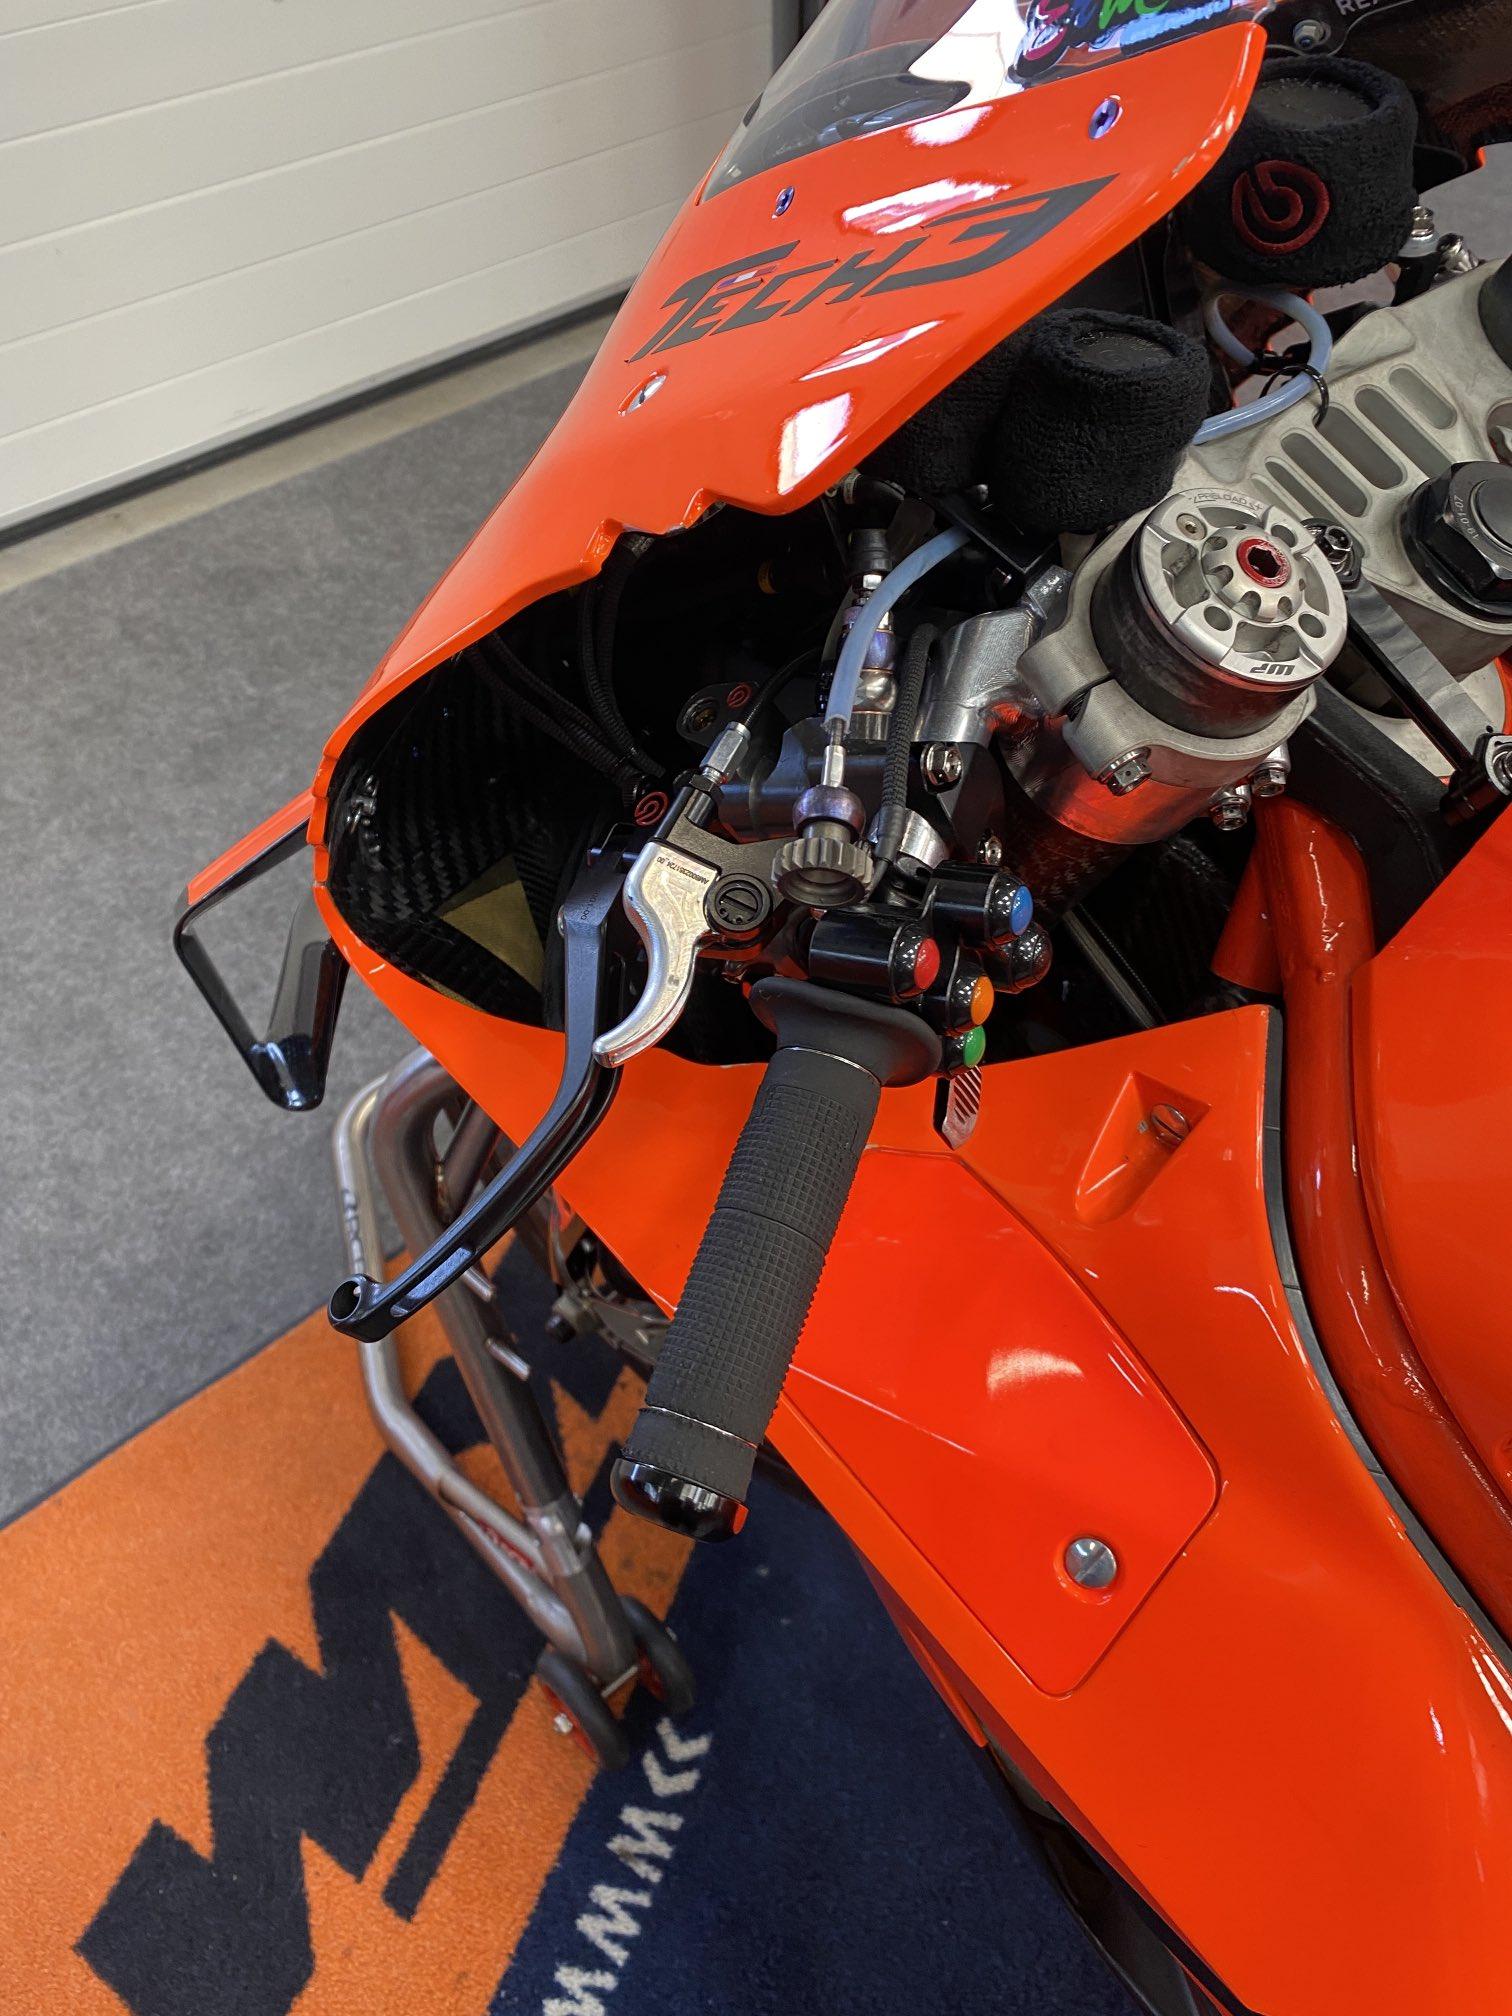 Moto GP 2021 - Page 16 E12pqjxXIAA1-O2?format=jpg&name=large